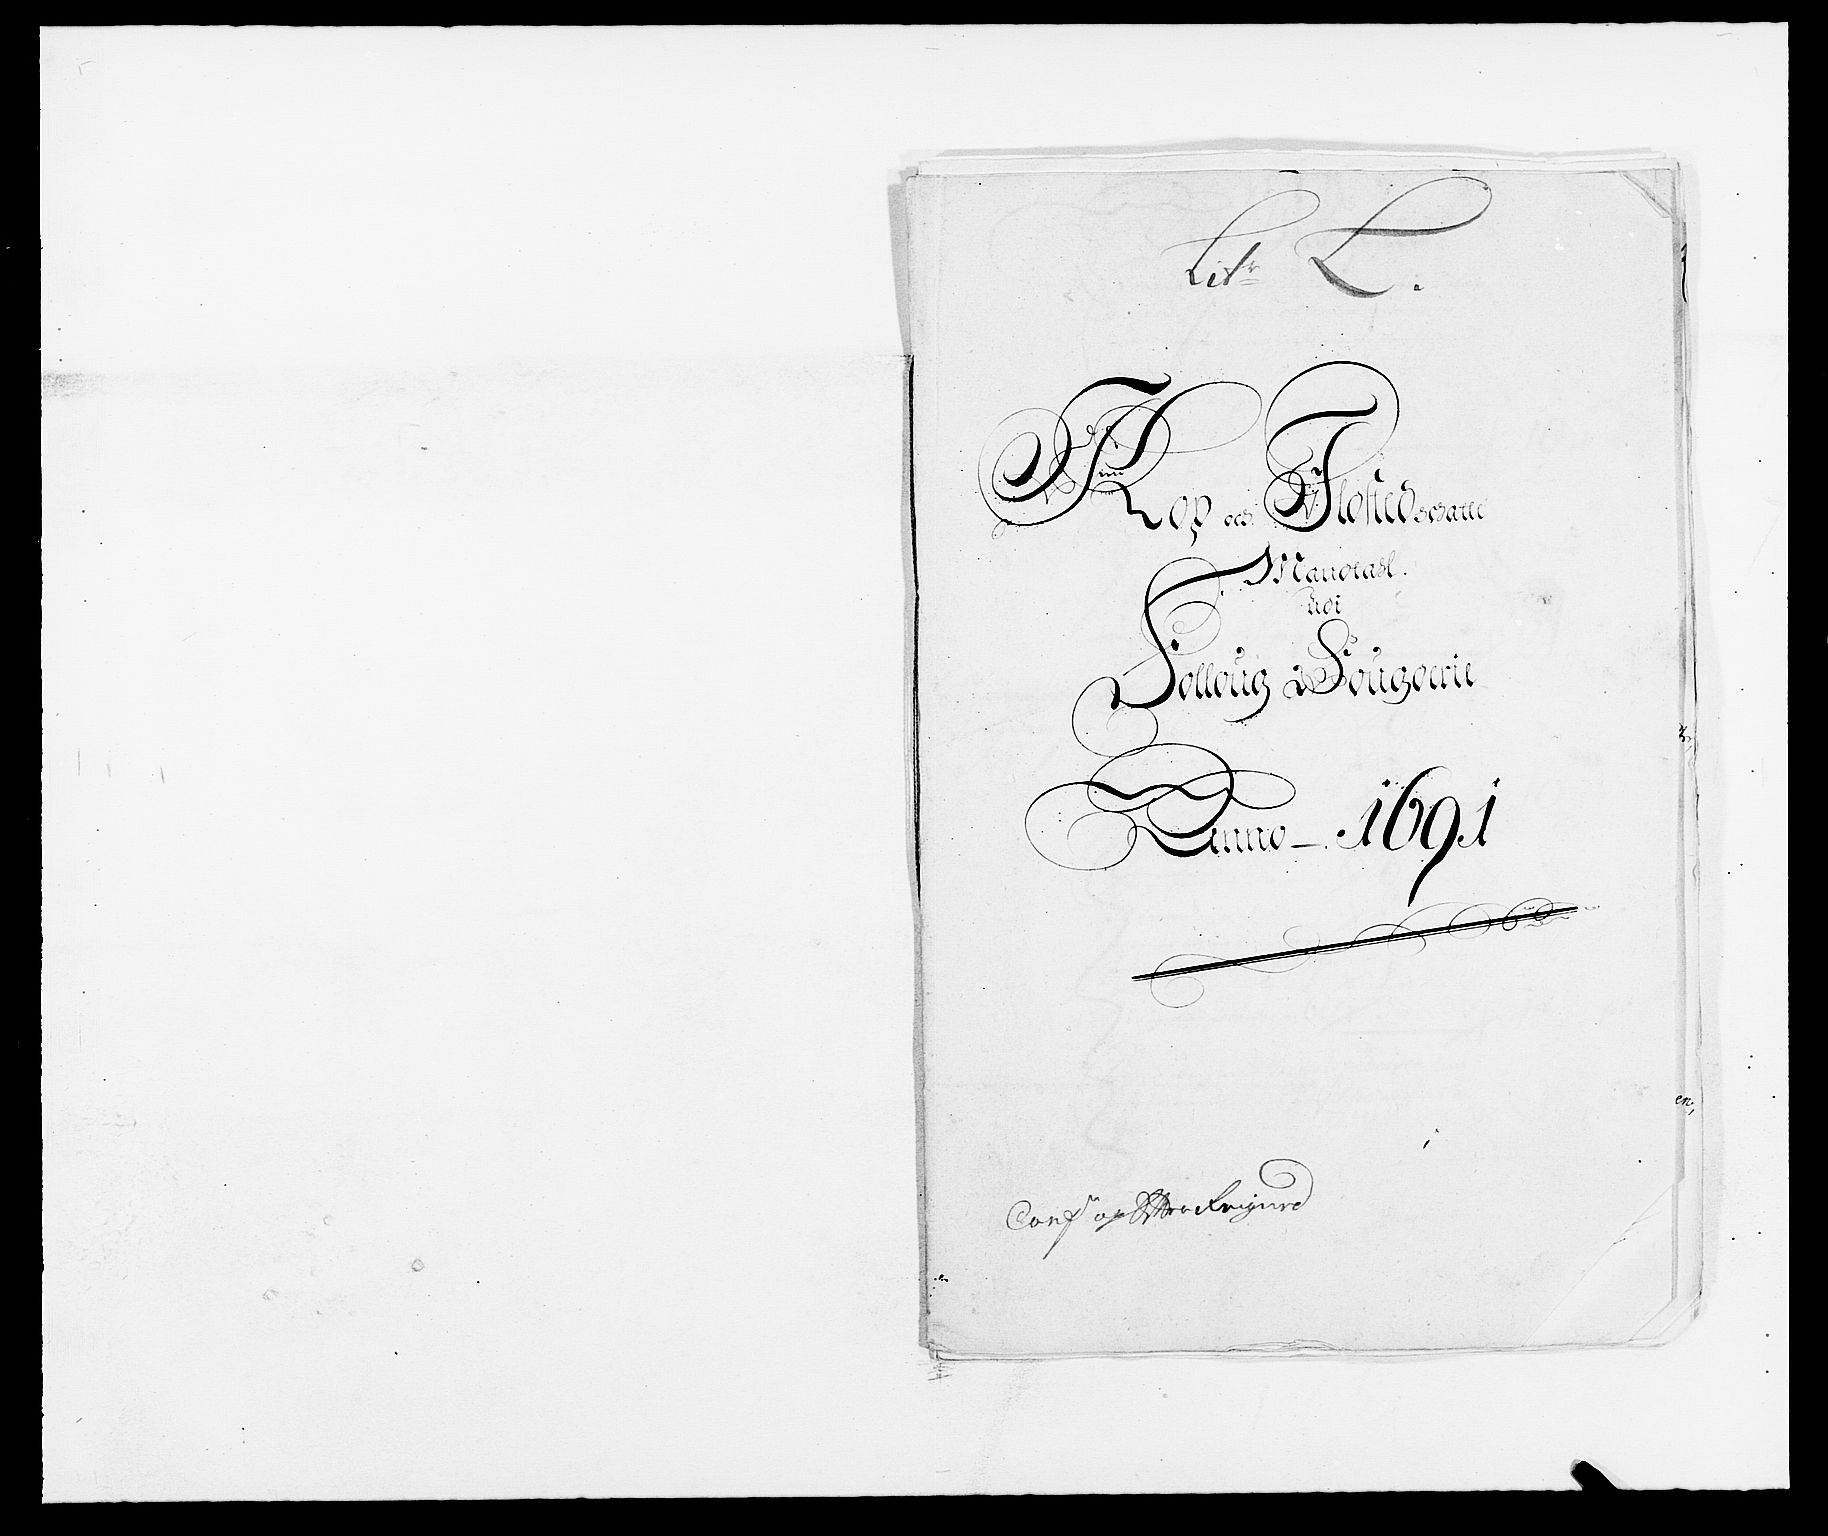 RA, Rentekammeret inntil 1814, Reviderte regnskaper, Fogderegnskap, R09/L0435: Fogderegnskap Follo, 1689-1691, s. 434